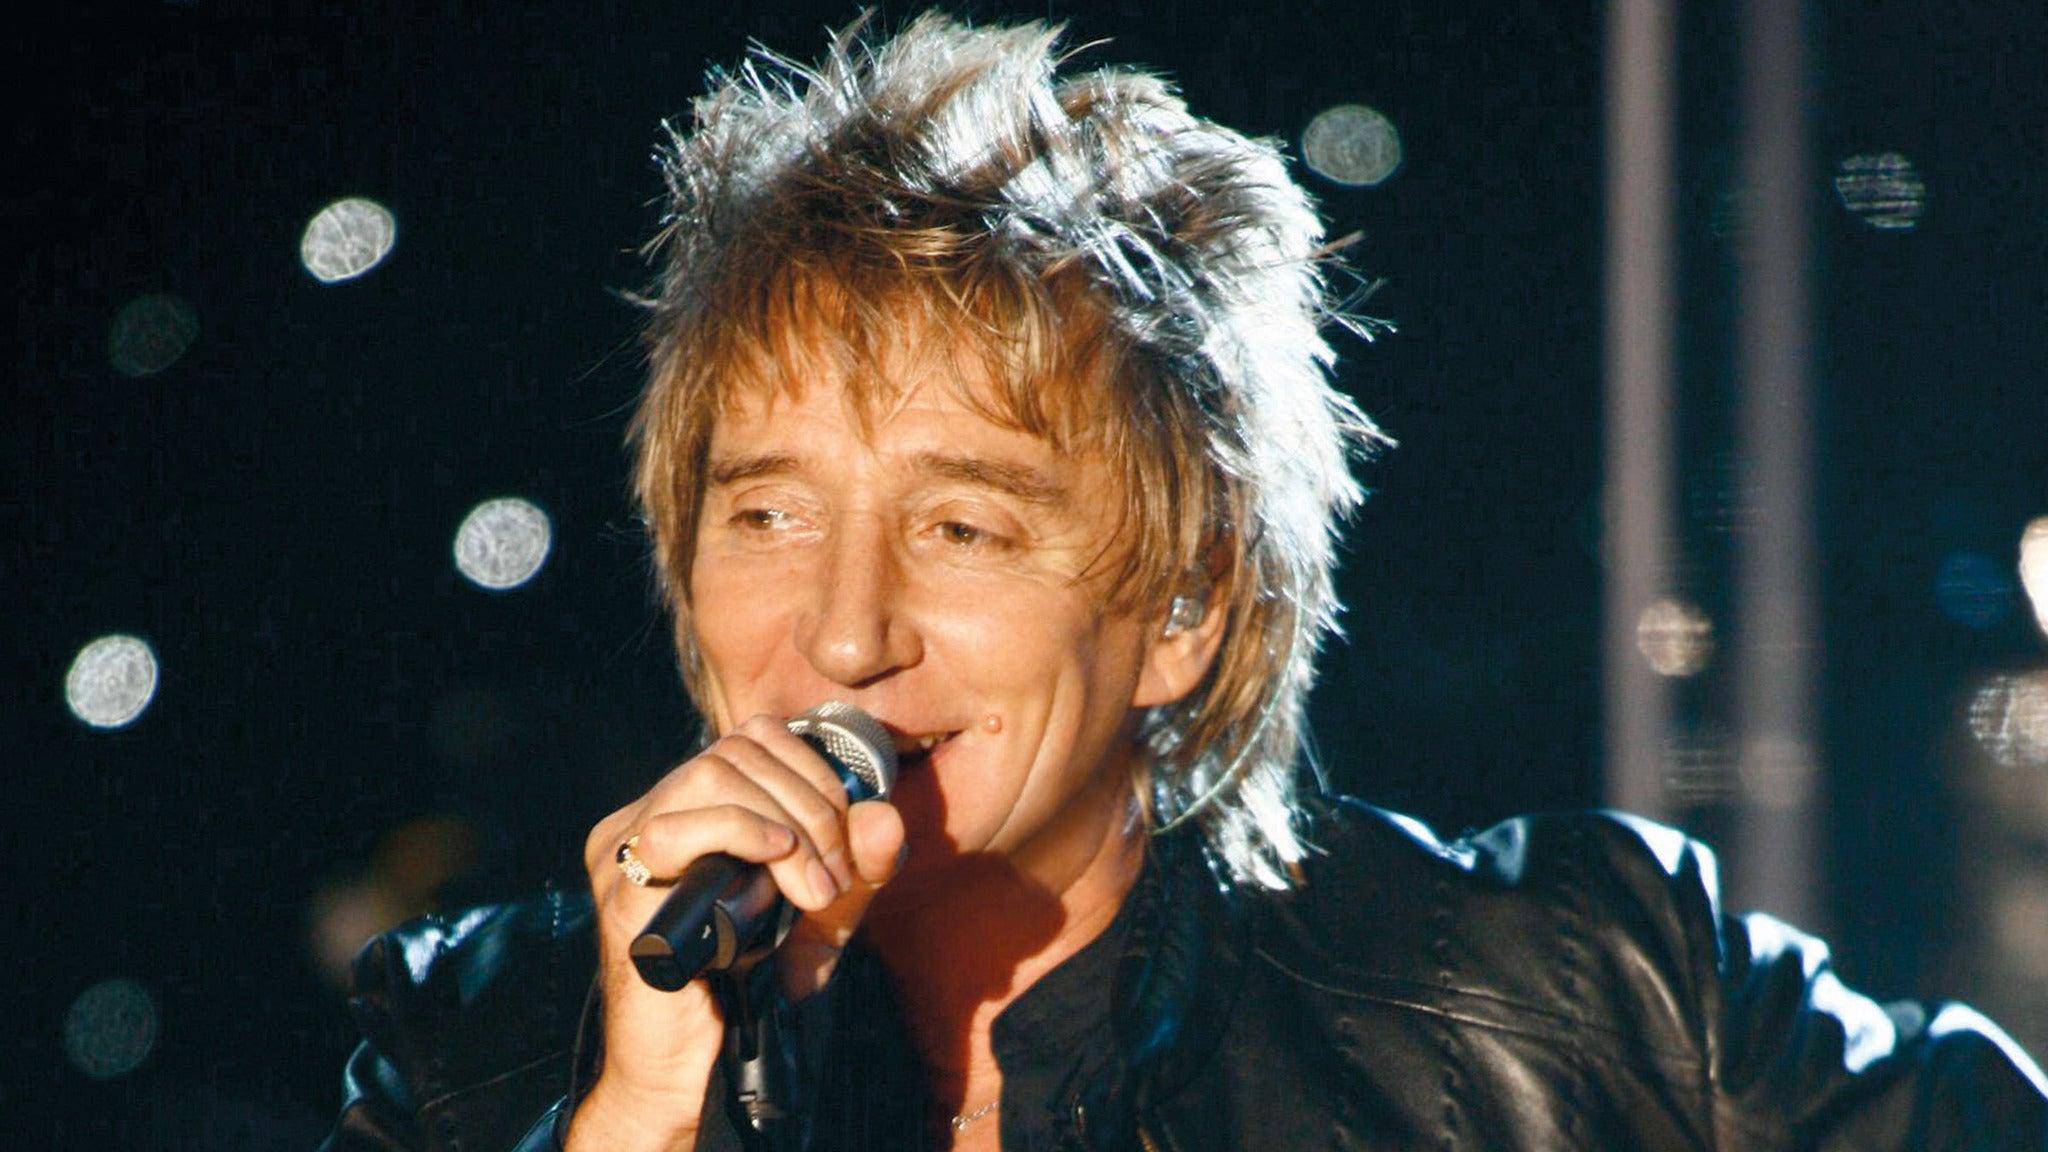 Rod Stewart W/special Guest Cyndi Lauper